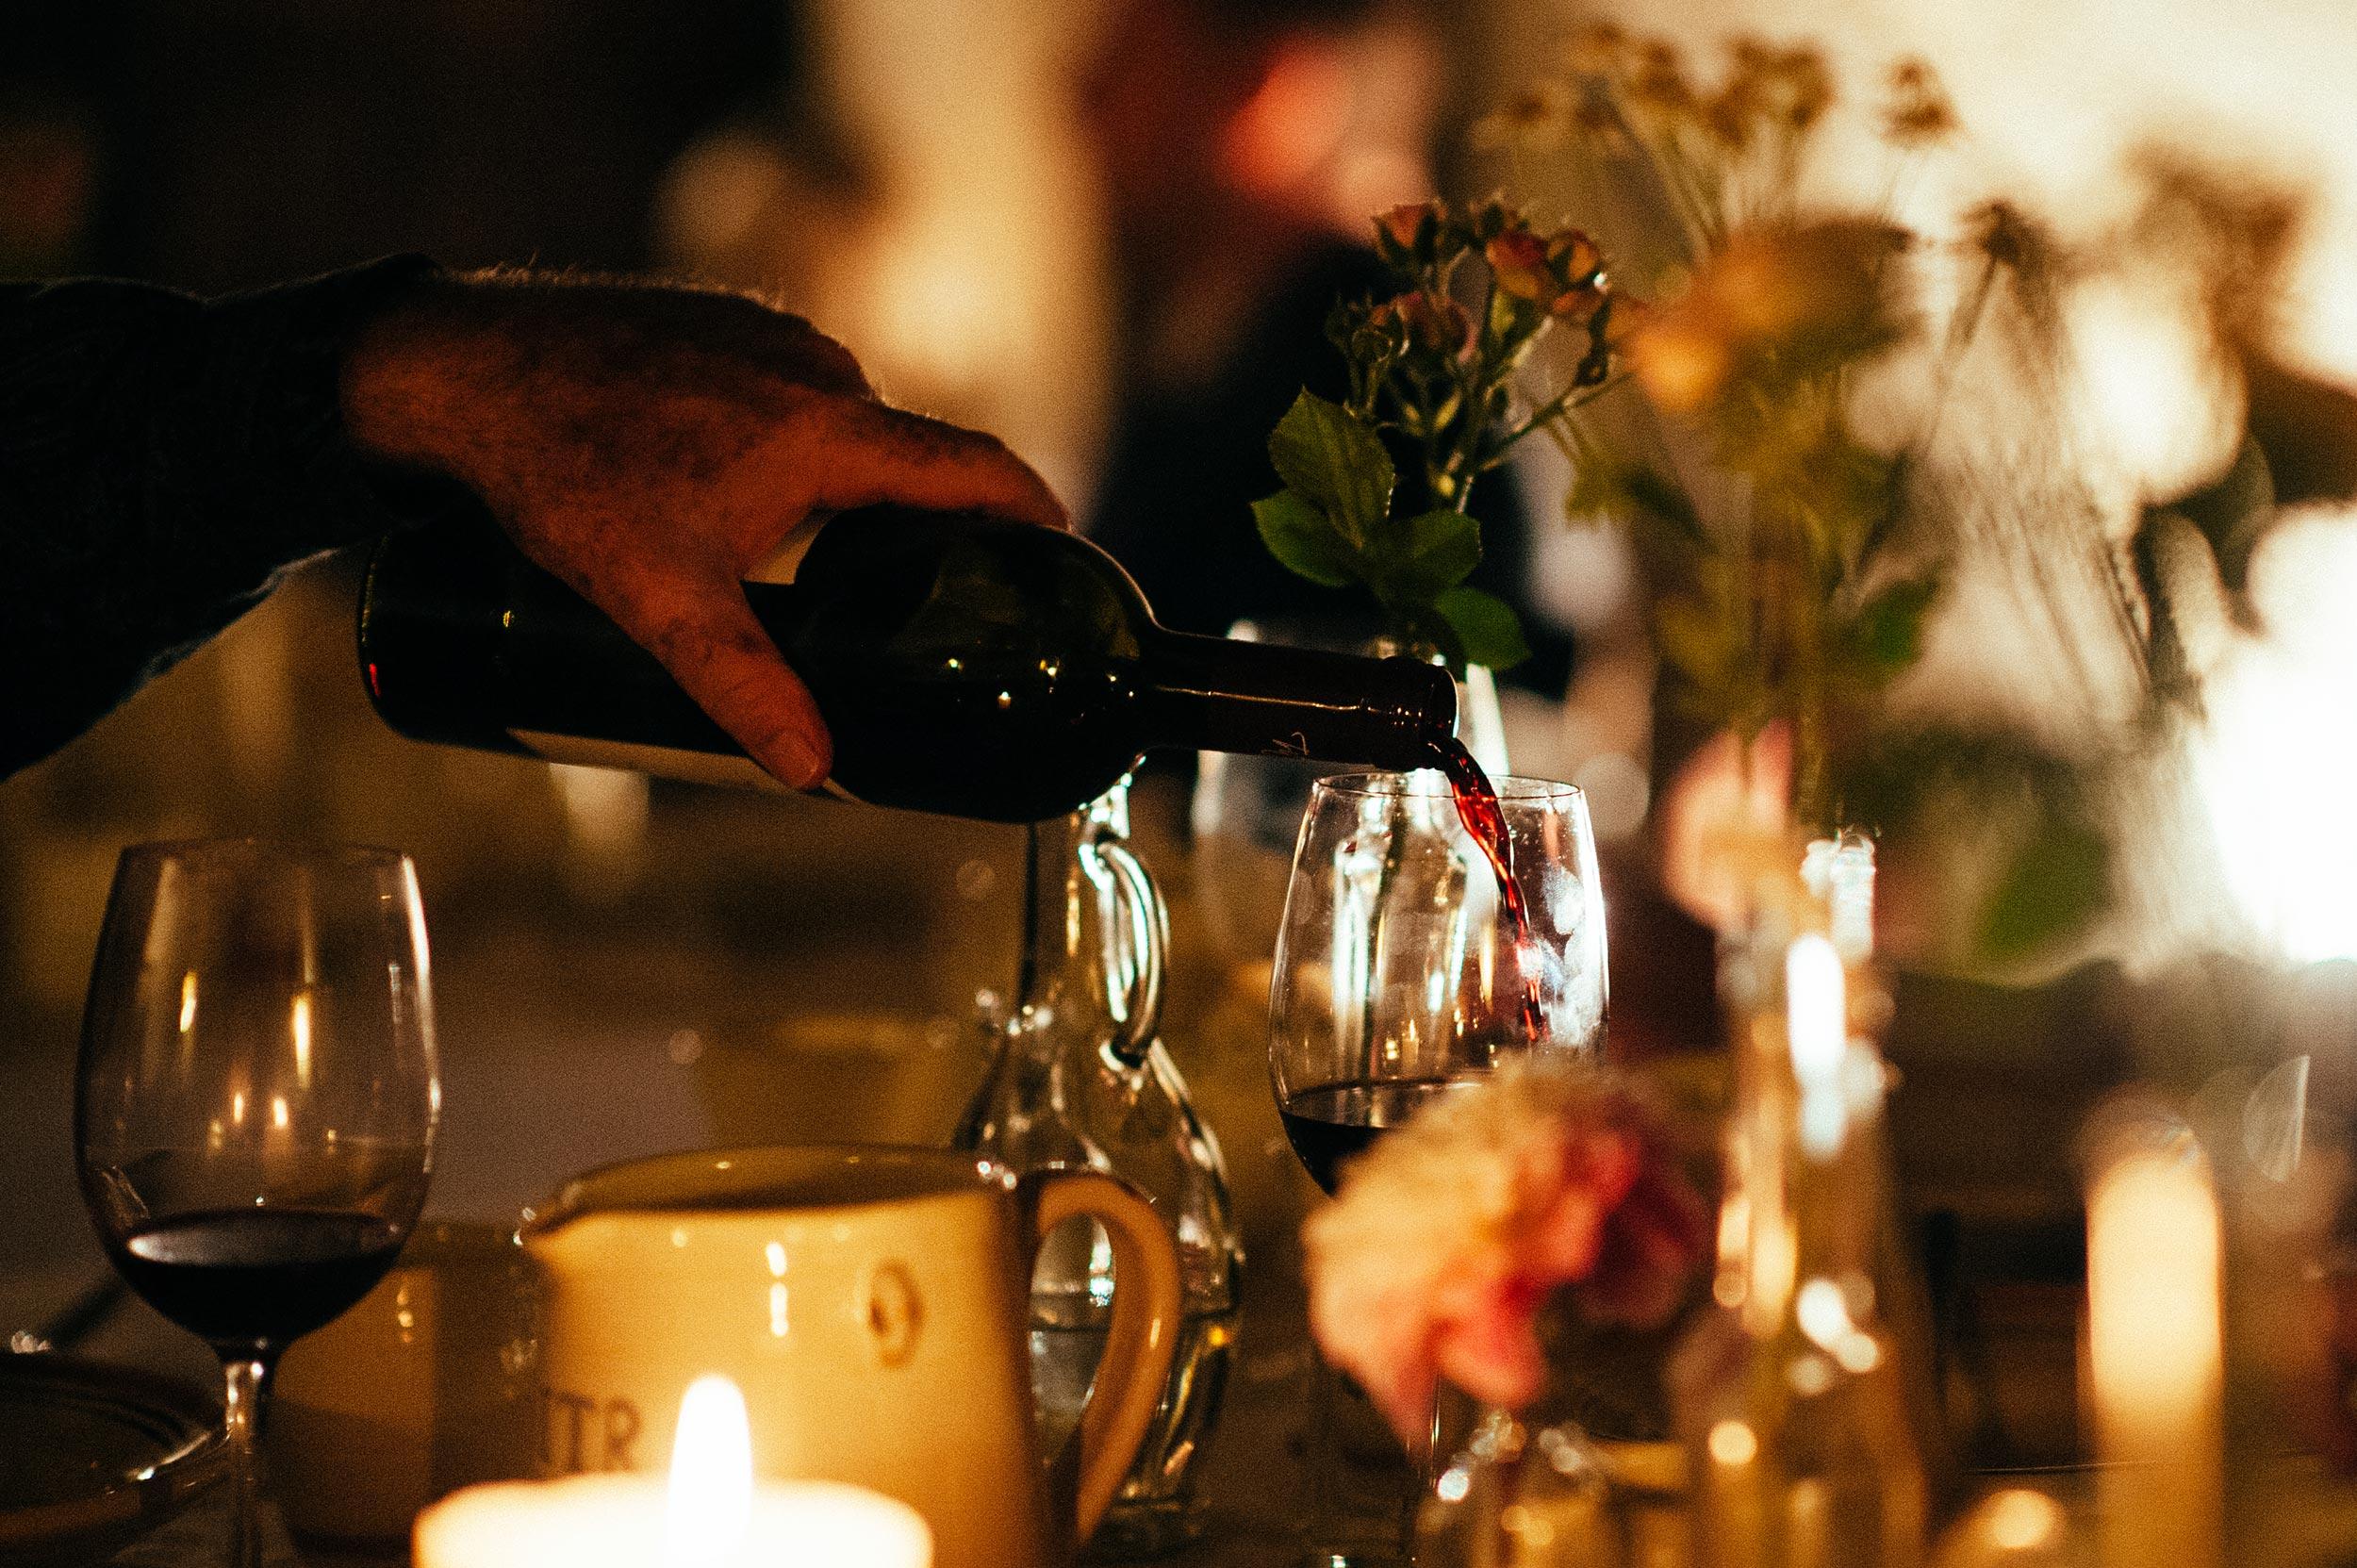 2014-Shelby-Jocelyn-Santo-Stefano-Di-Sessanio-Wedding-Photographer-Italy-Alessandro-Avenali-38.jpg